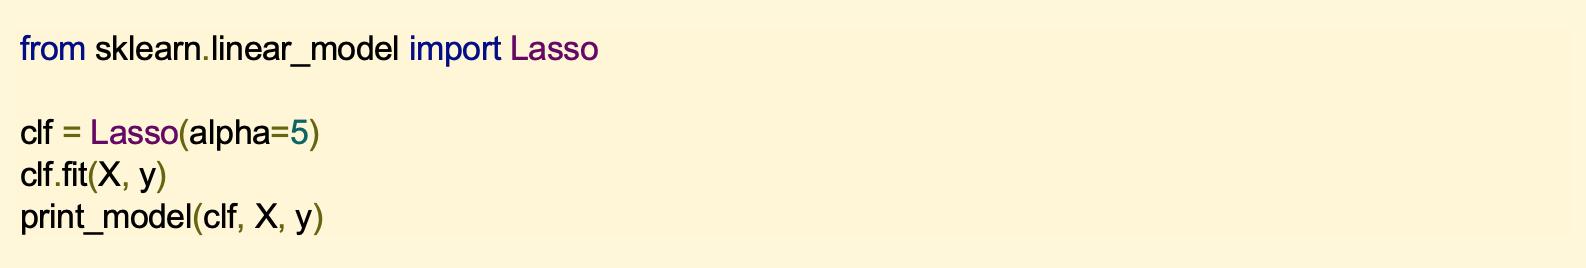 from sklearn.linear_model import Lasso clf = Lasso(alpha=5) clf.fit(X, y) print_model(clf, X, y)